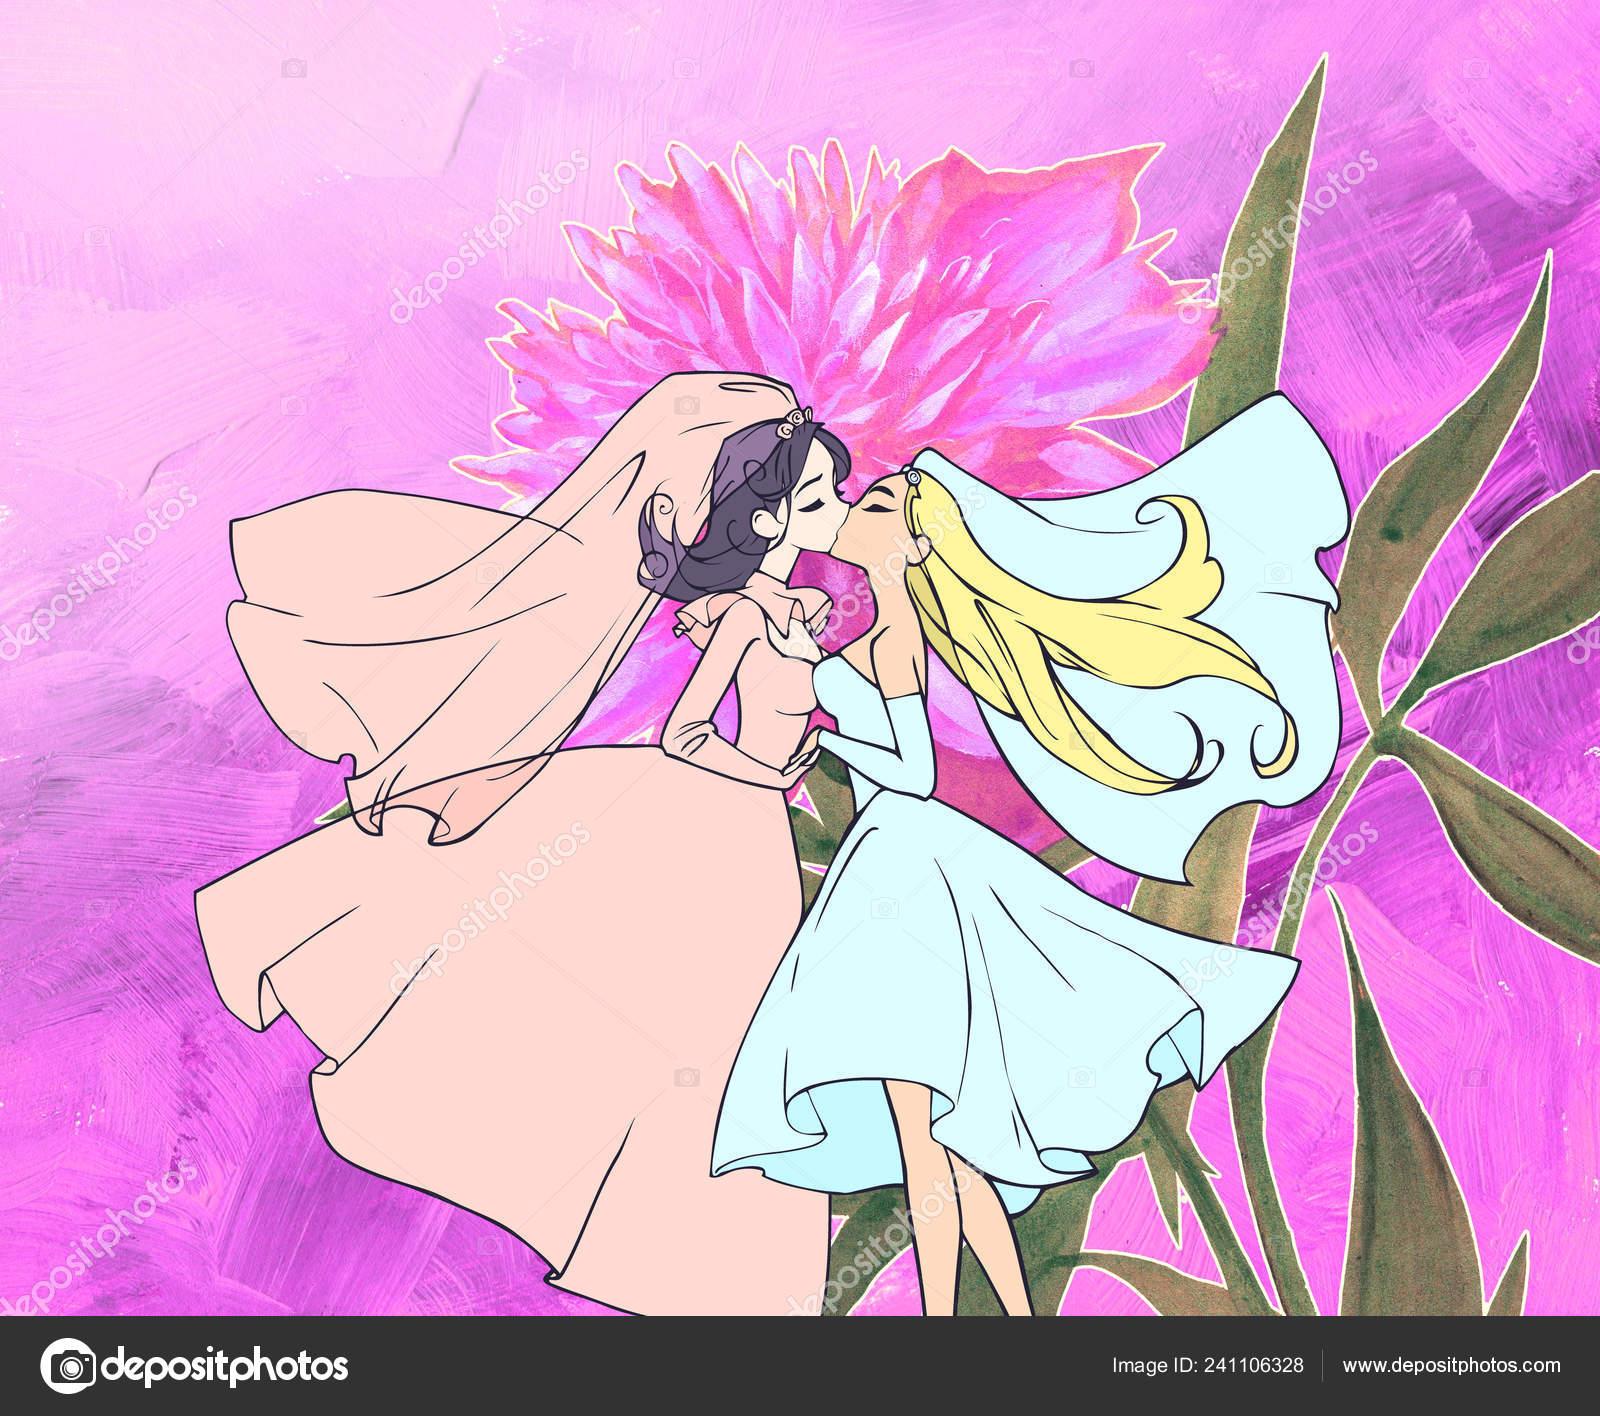 Anime In Love Wallpaper Beautiful Cartoon Anime Wedding Illustration Two Pretty Homosexual Women Getting Stock Photo C A Petruk 241106328